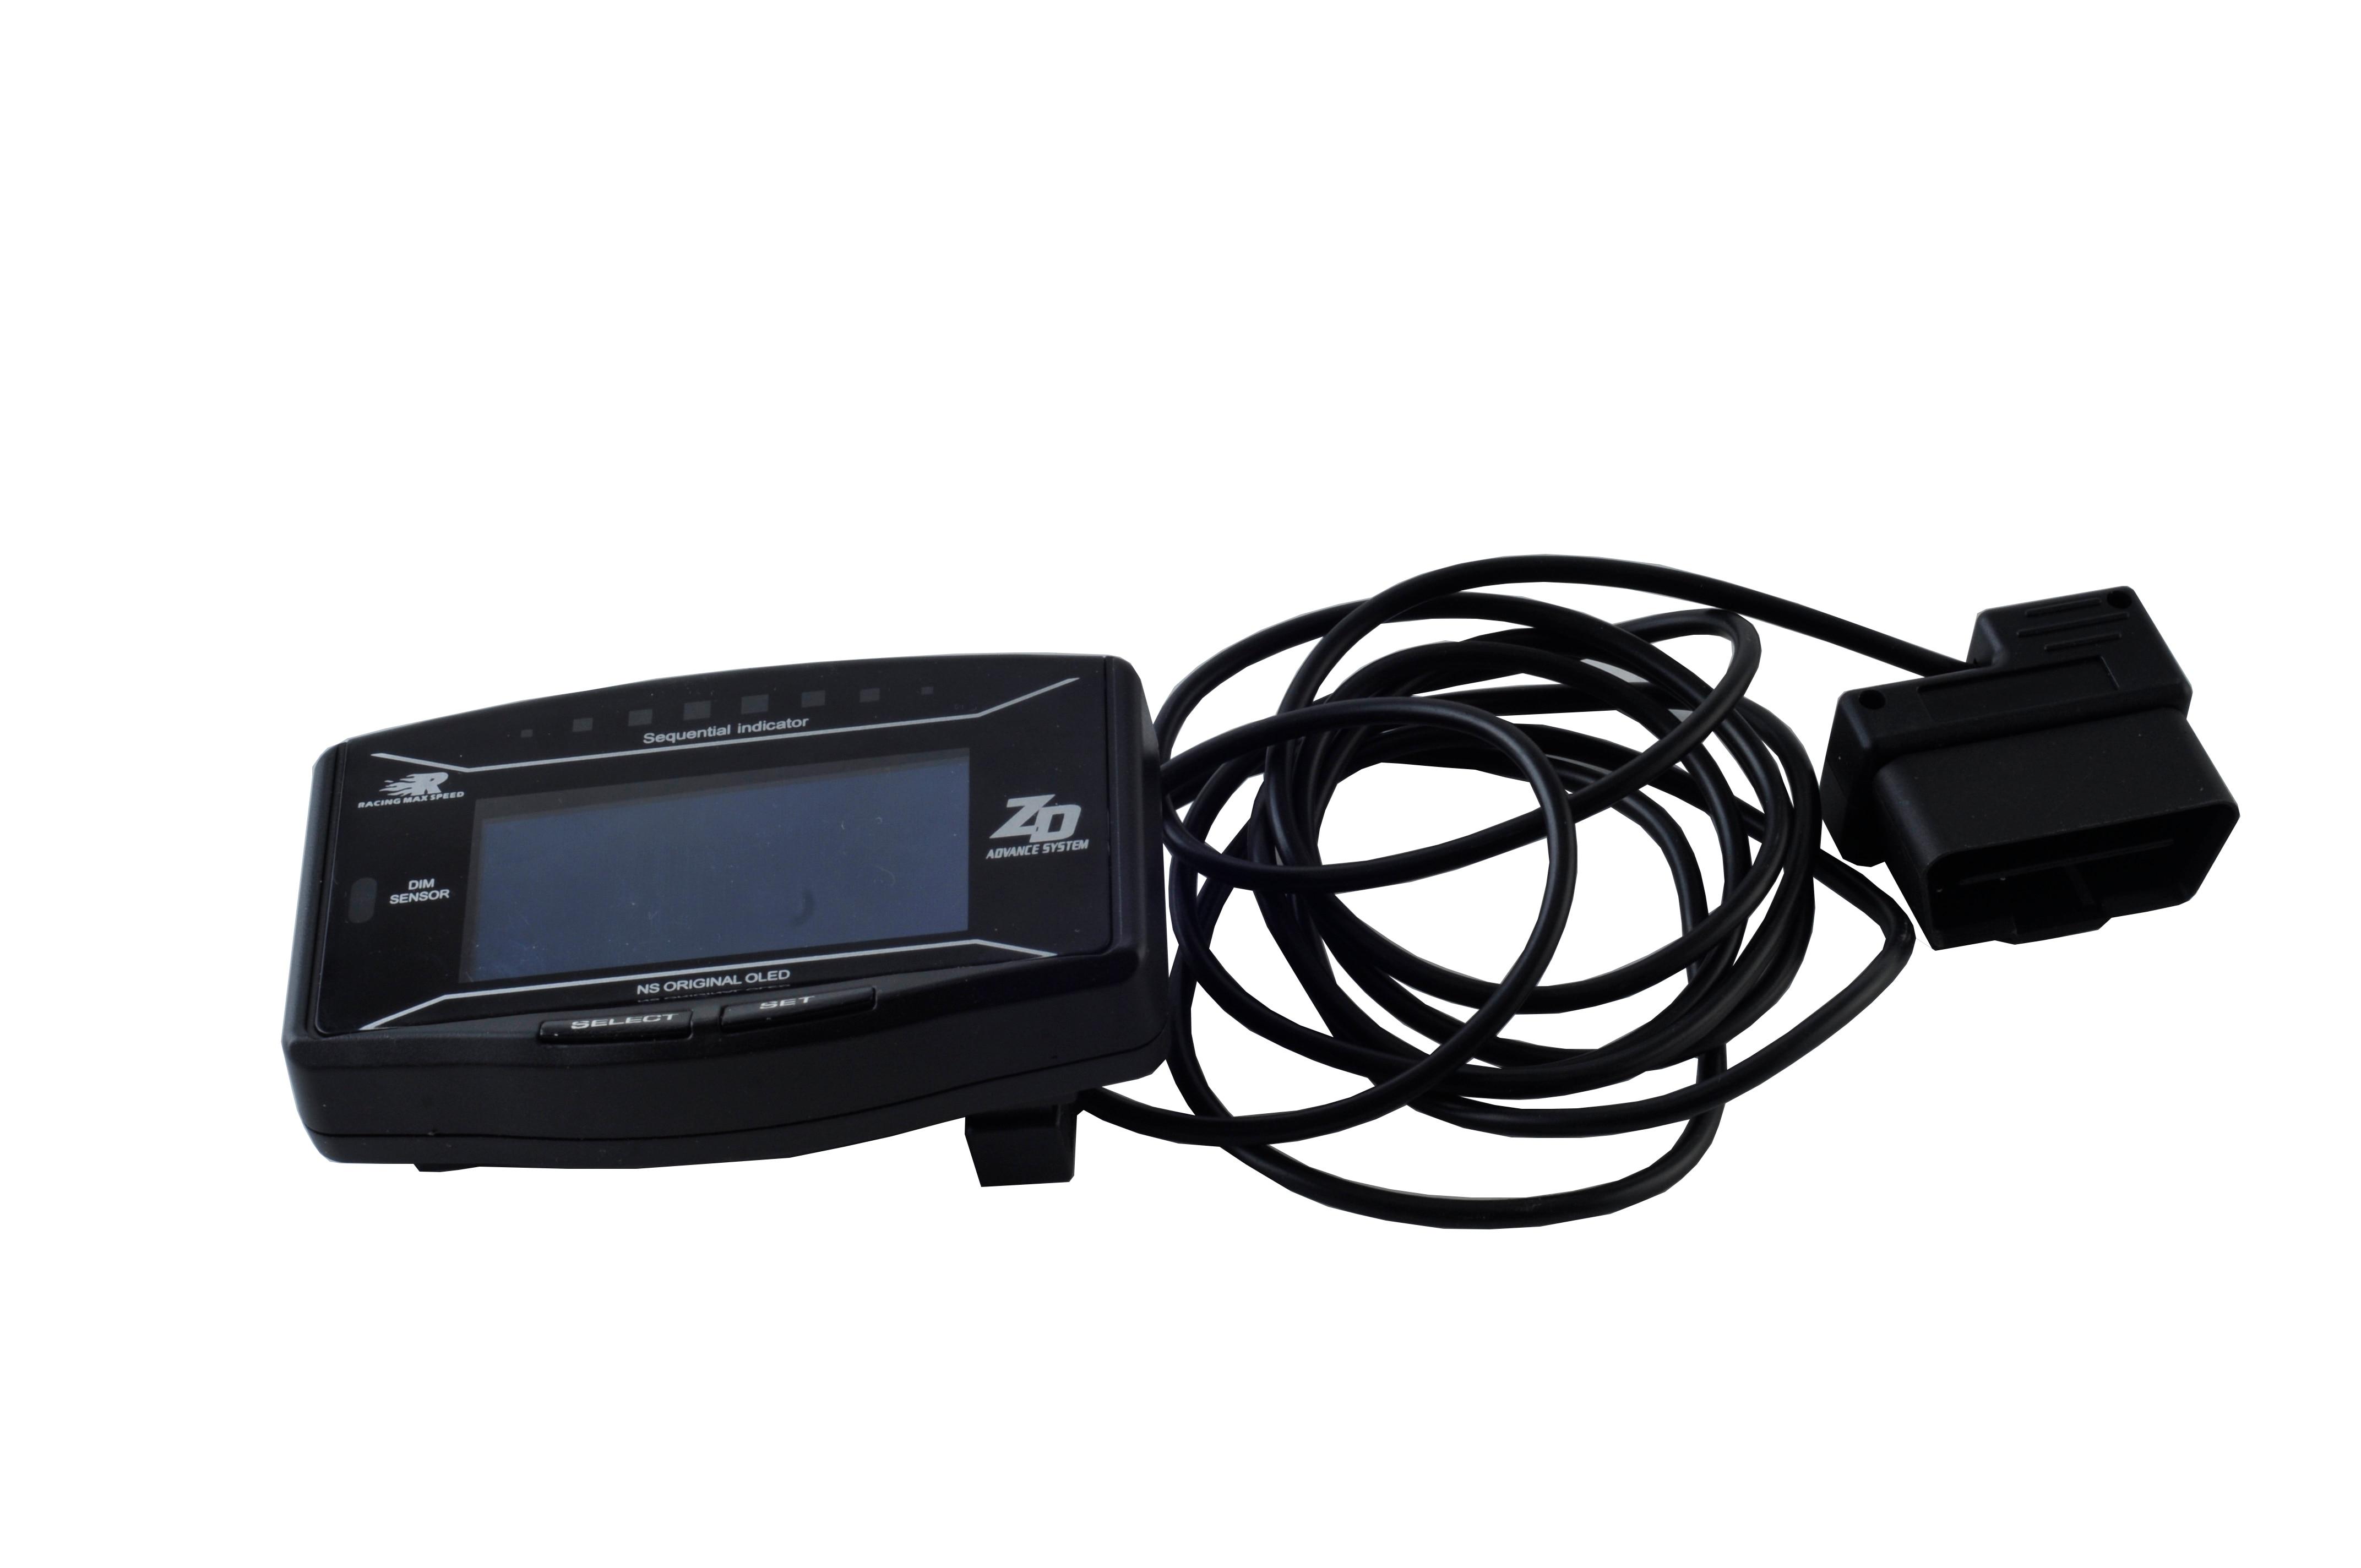 OBD2 Advance ZD 10 in1 Defi style link автоматический датчик цифровой тахометр температура воды ODO часы Trip Defi измеритель